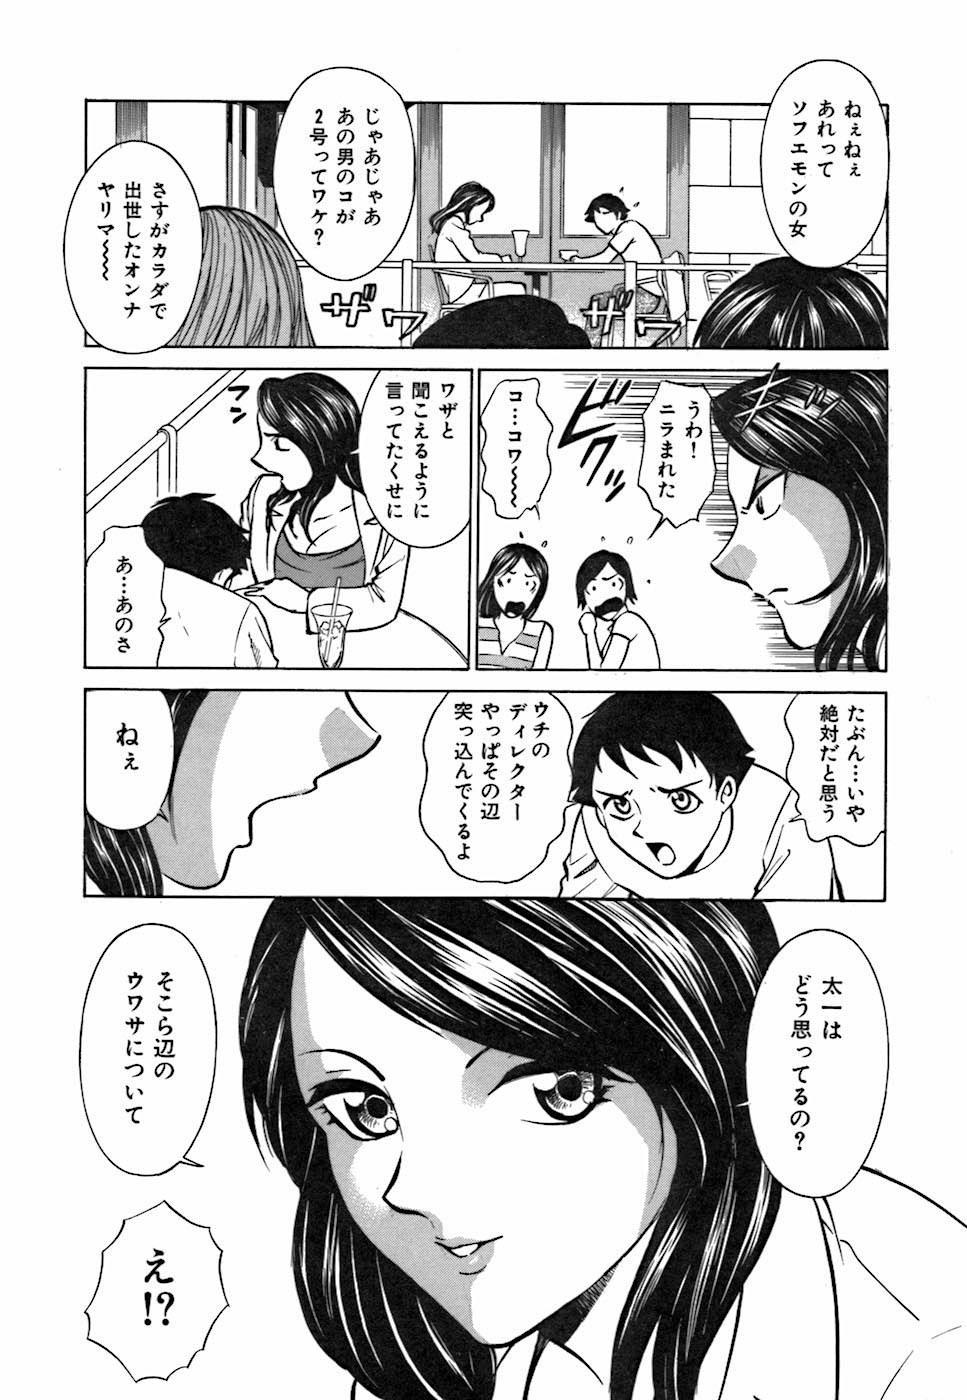 Kimi ga Nozomu Katachi | Appearance for which you hope 129